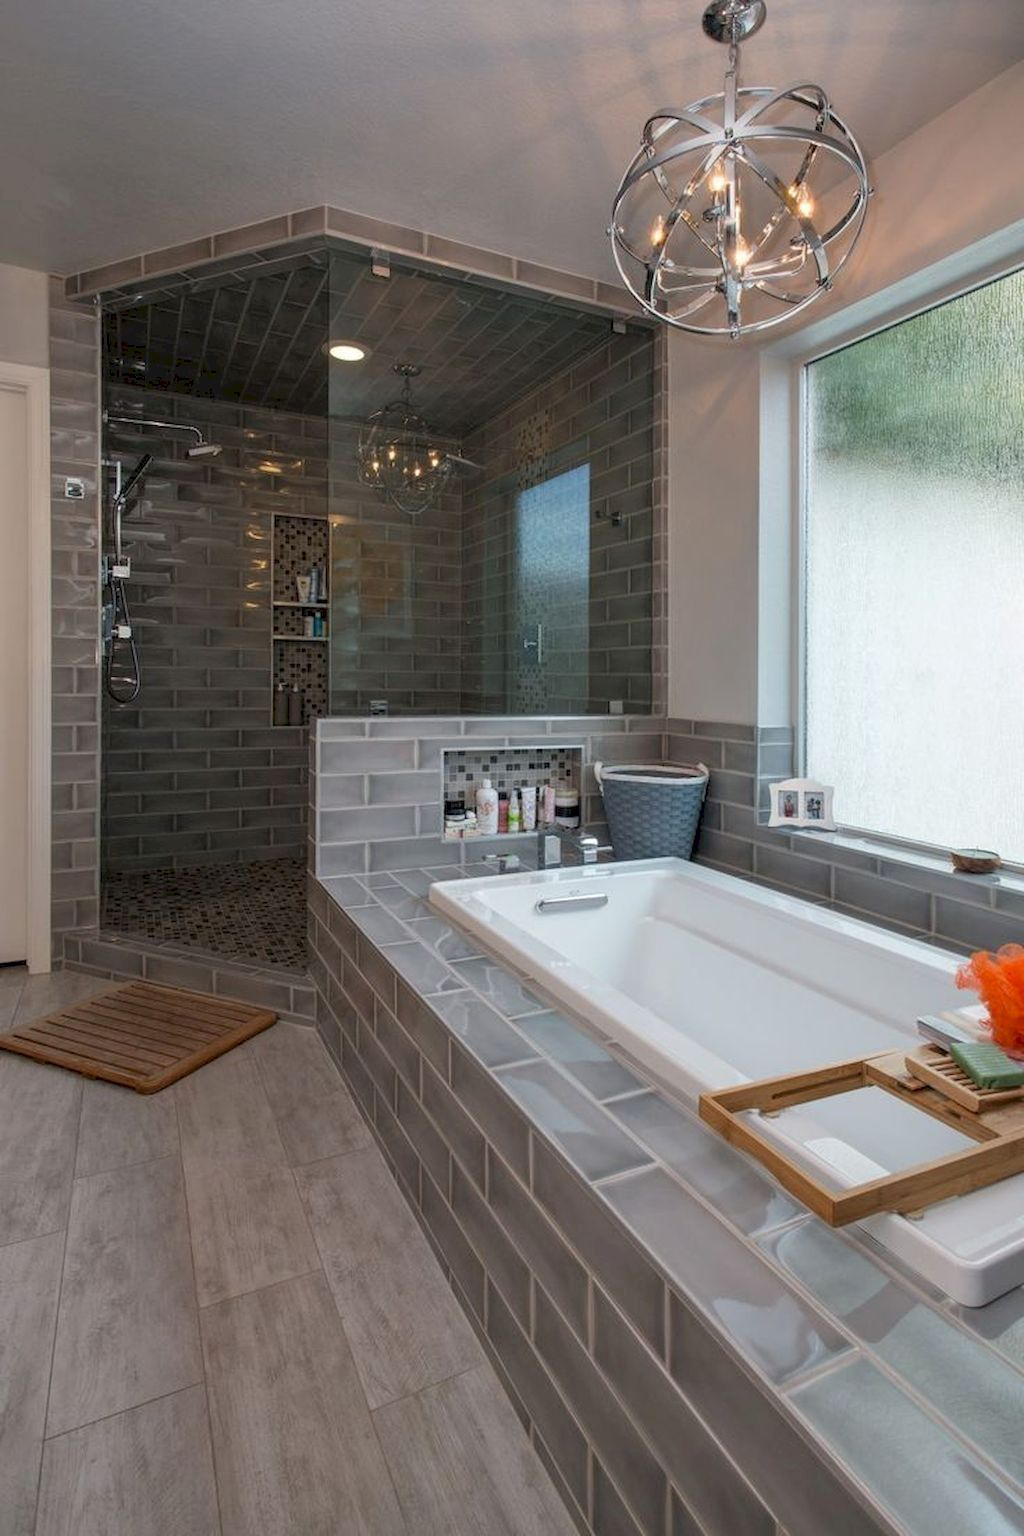 65 Farmhouse Master Bathroom Remodel Decor Ideas #dreambathrooms